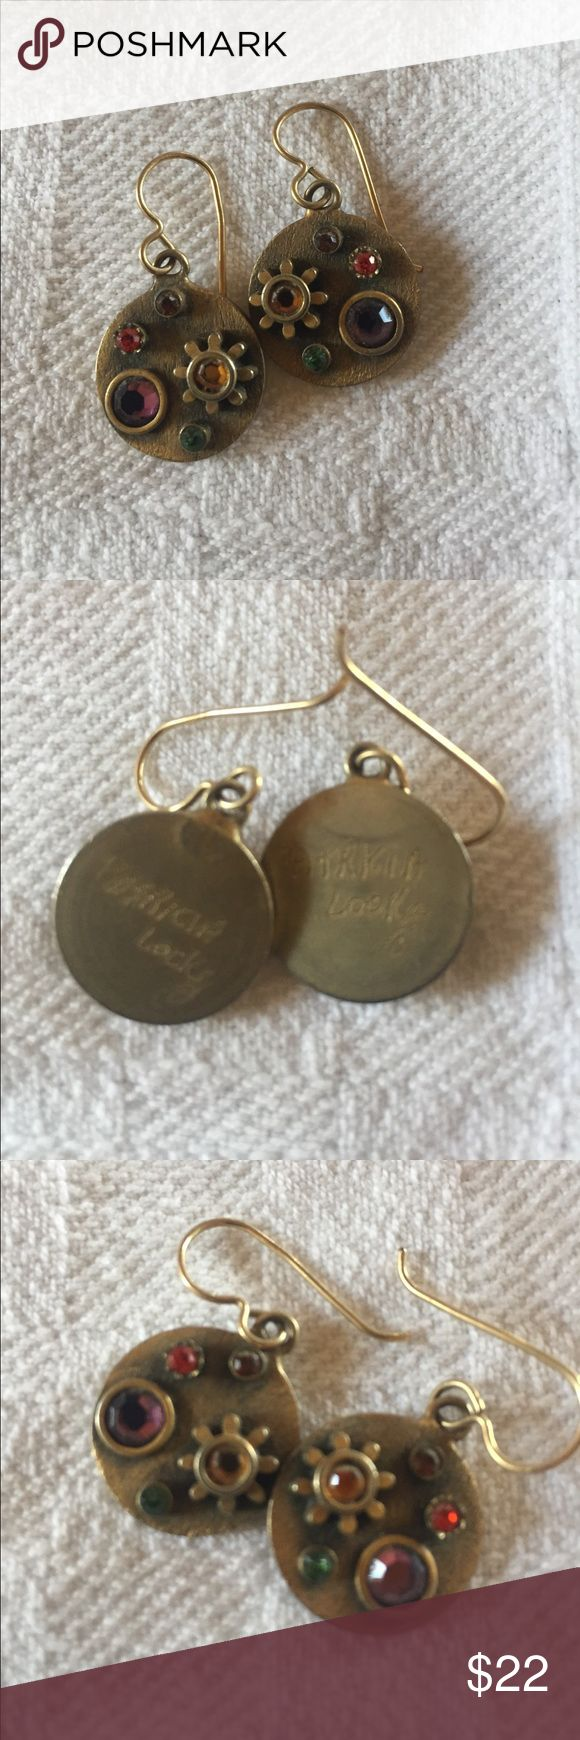 Patricia Locke earrings💛💜❤️ Beautiful earrings, perfect condition, lovely color. Patricia Locke Jewelry Earrings